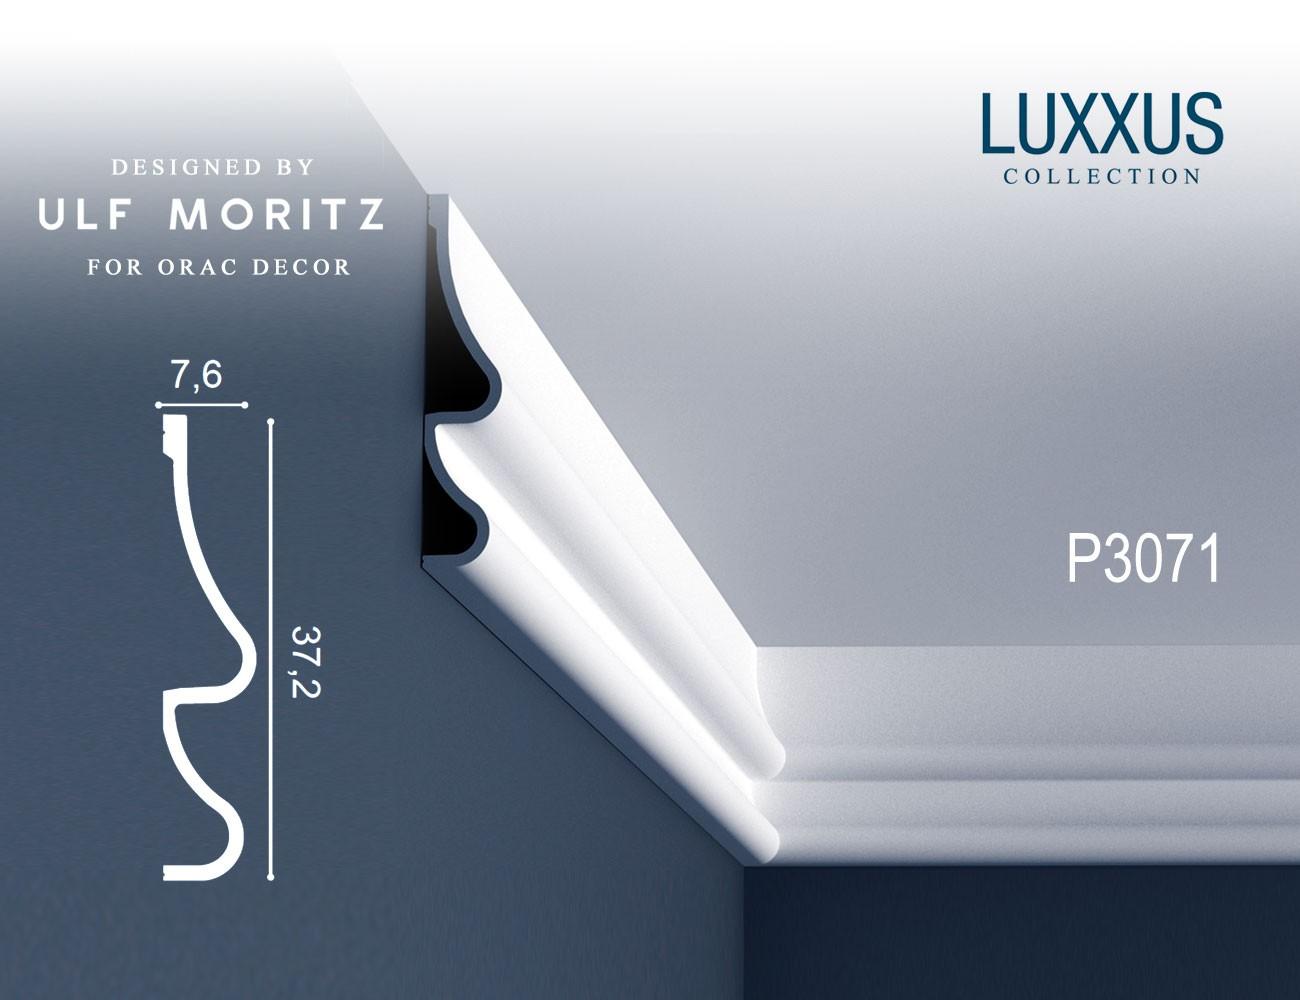 wandleiste stuck orac decor p3071 golf ulf moritz luxxus stuckleiste